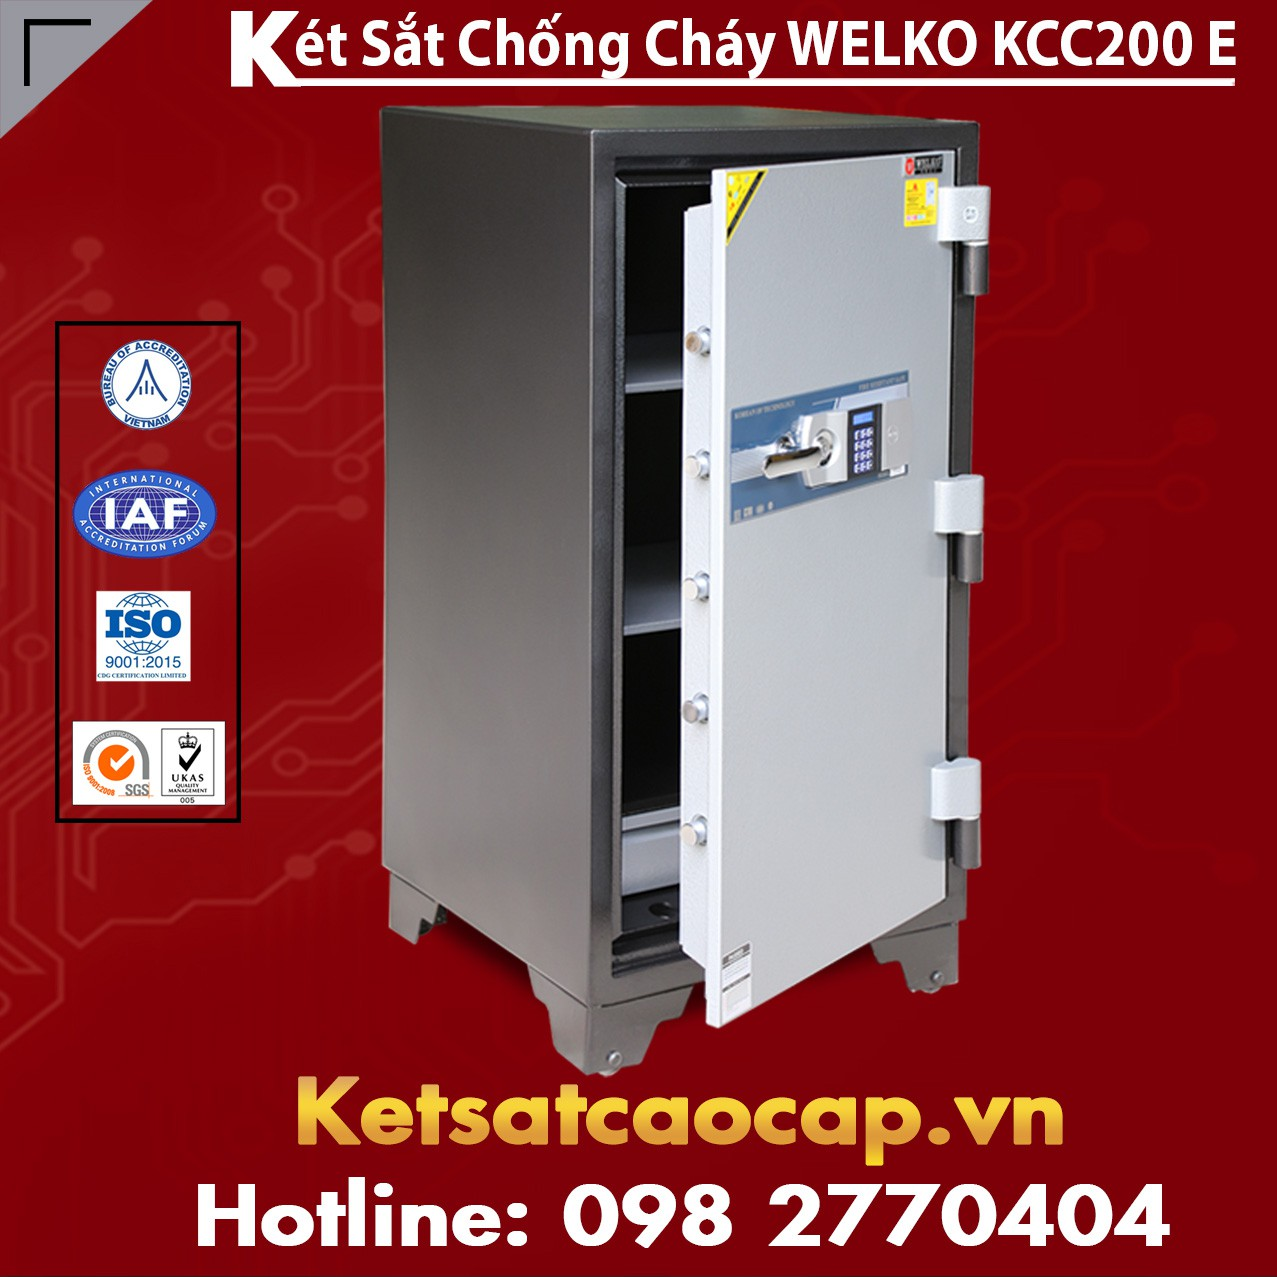 Két Sắt Bình Dương WELKO KCC200 E (Sửa)